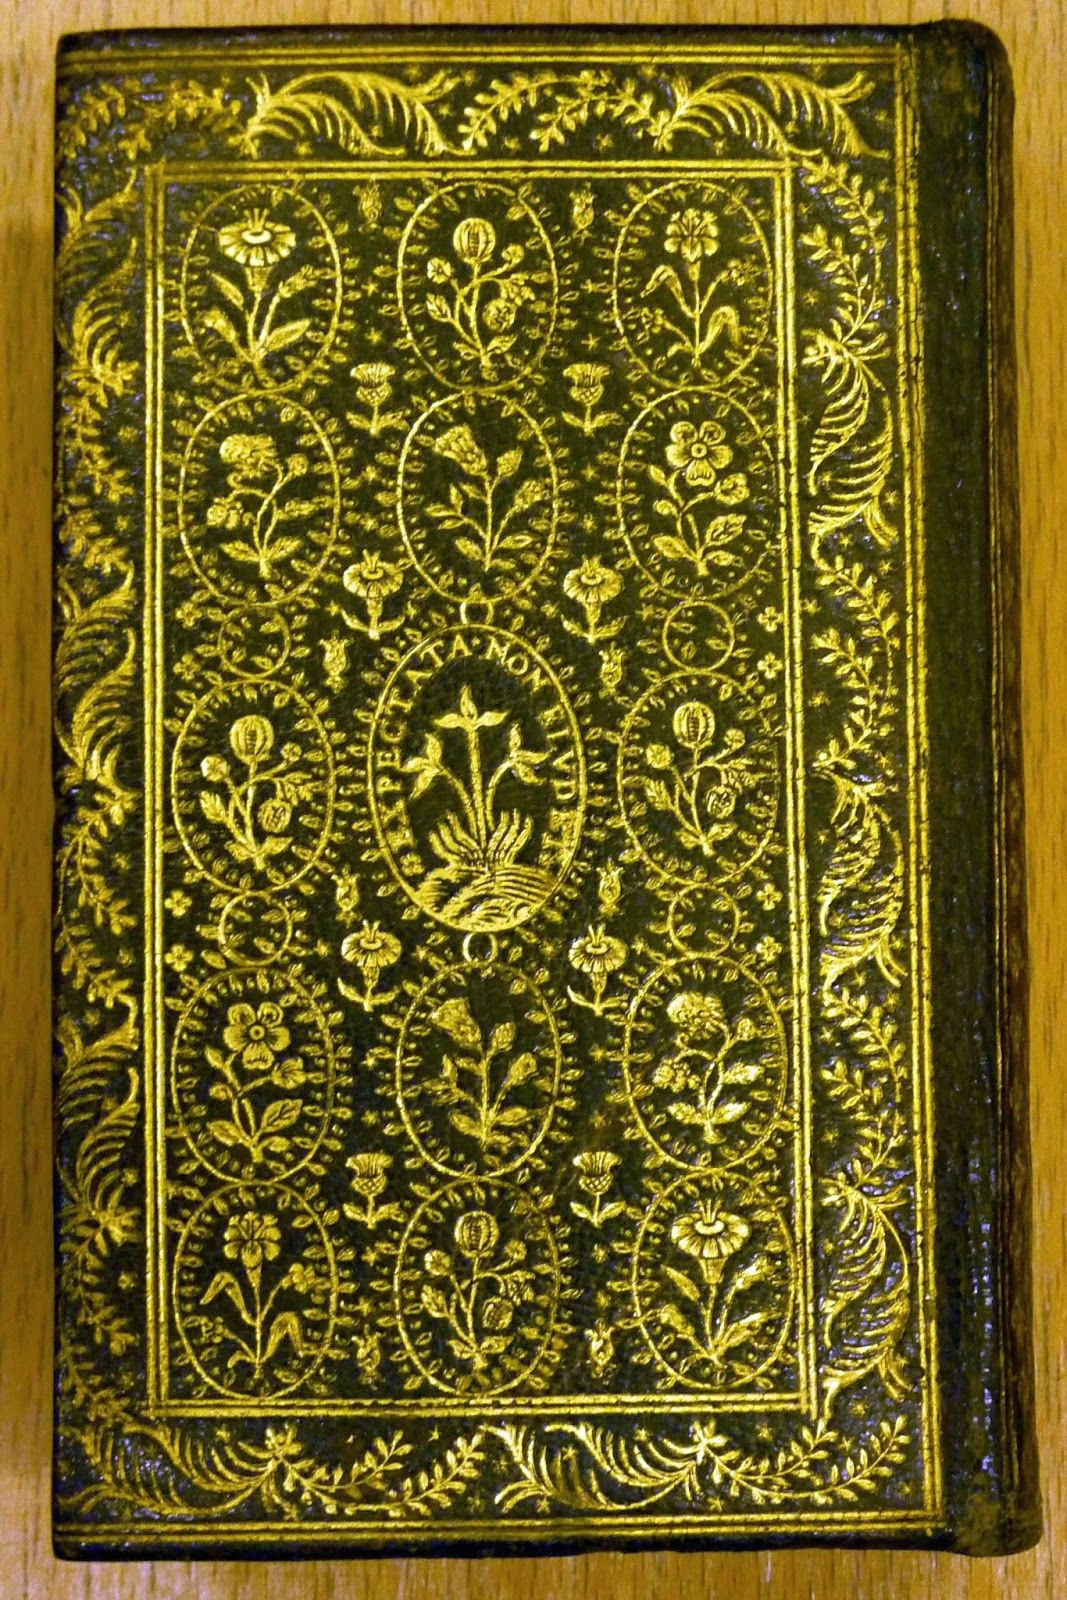 The Beggar S Daughter Parts 4744 4747 Libri Antichi Libri